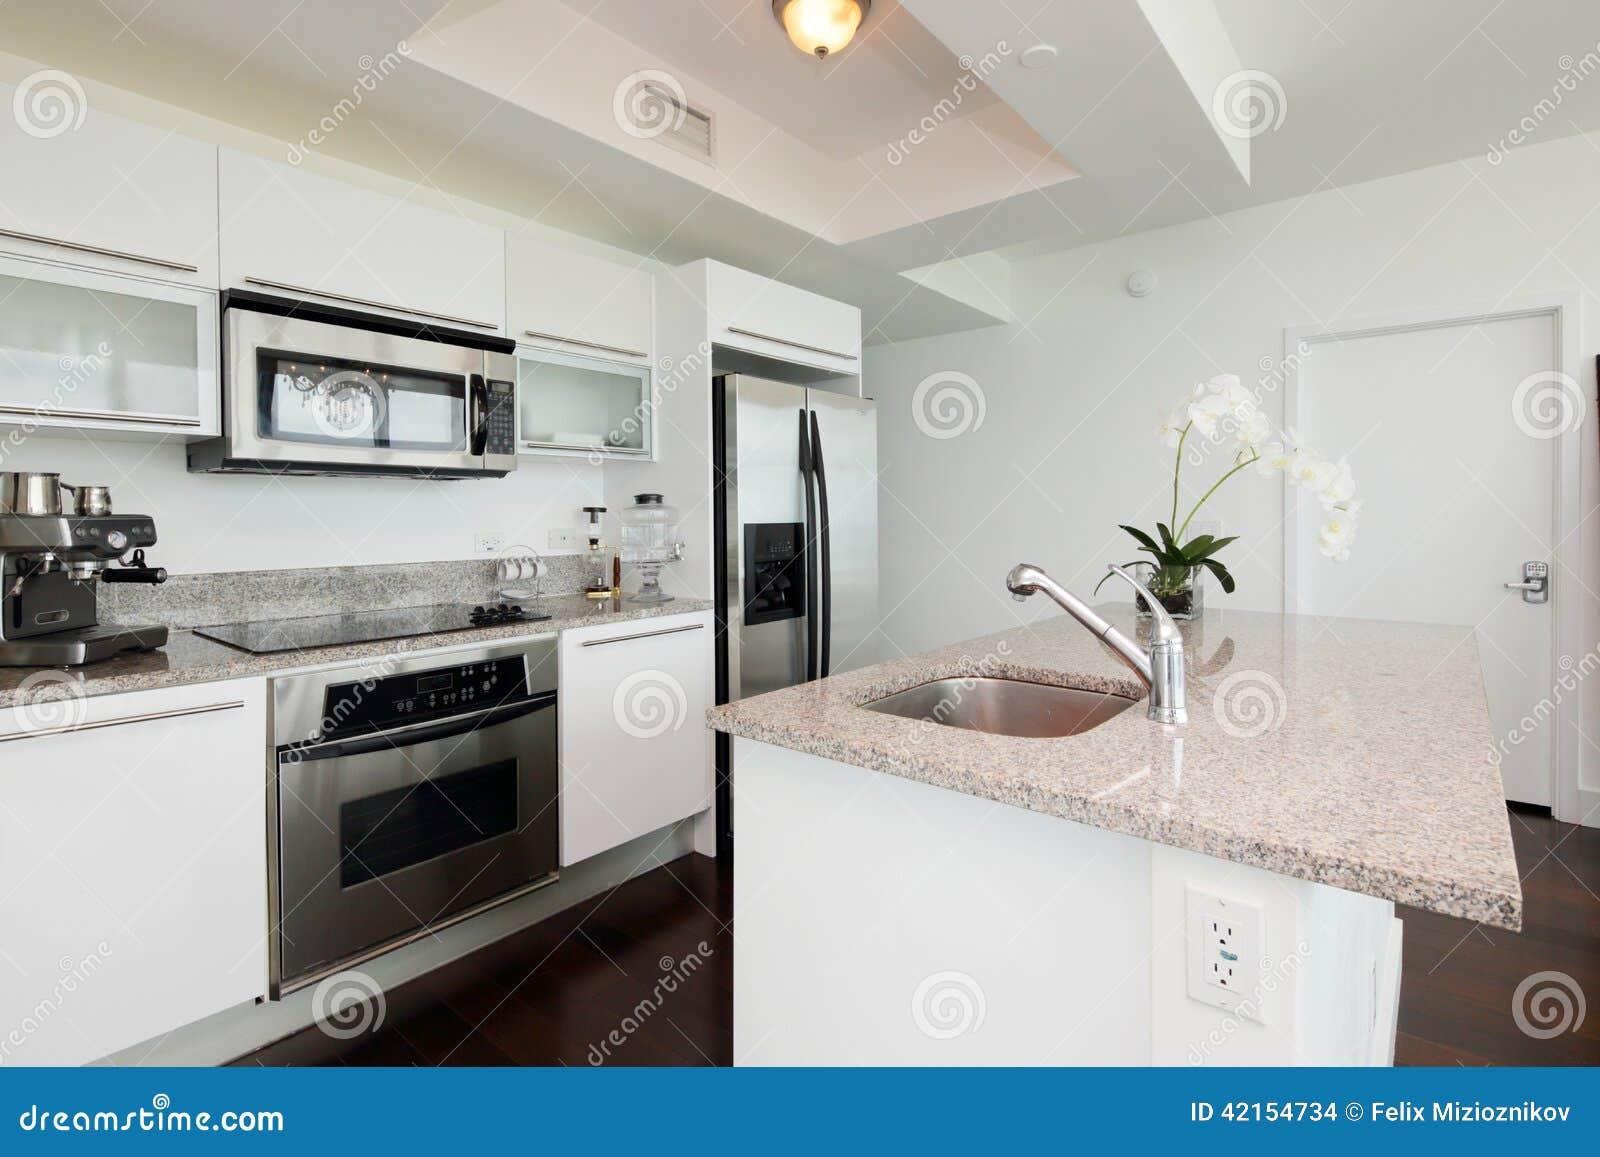 moderne k che mit einer insel stockfoto bild 42154734. Black Bedroom Furniture Sets. Home Design Ideas